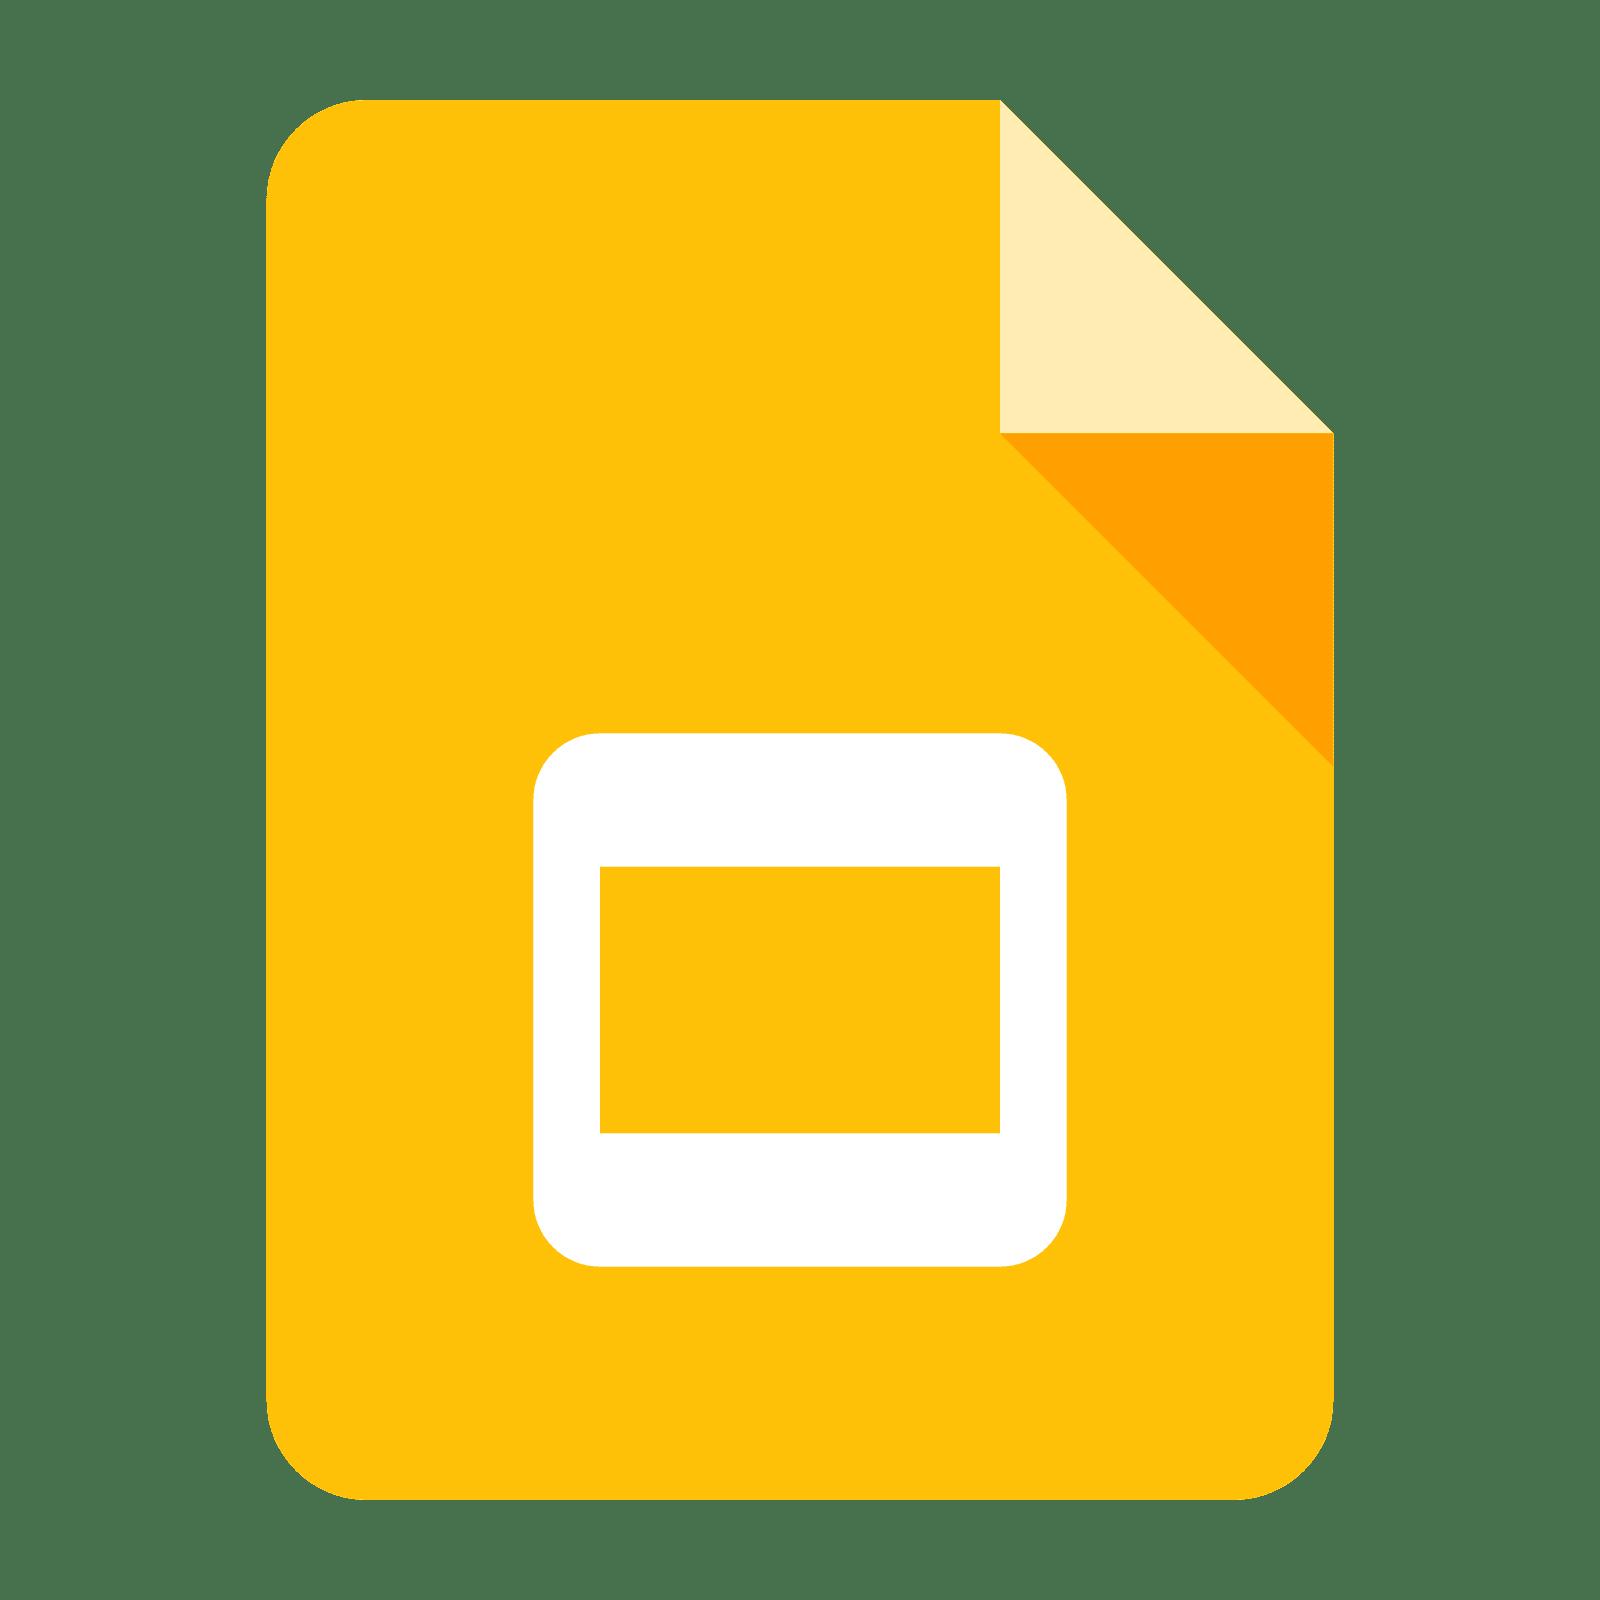 Google slides png. Free technology for teachers